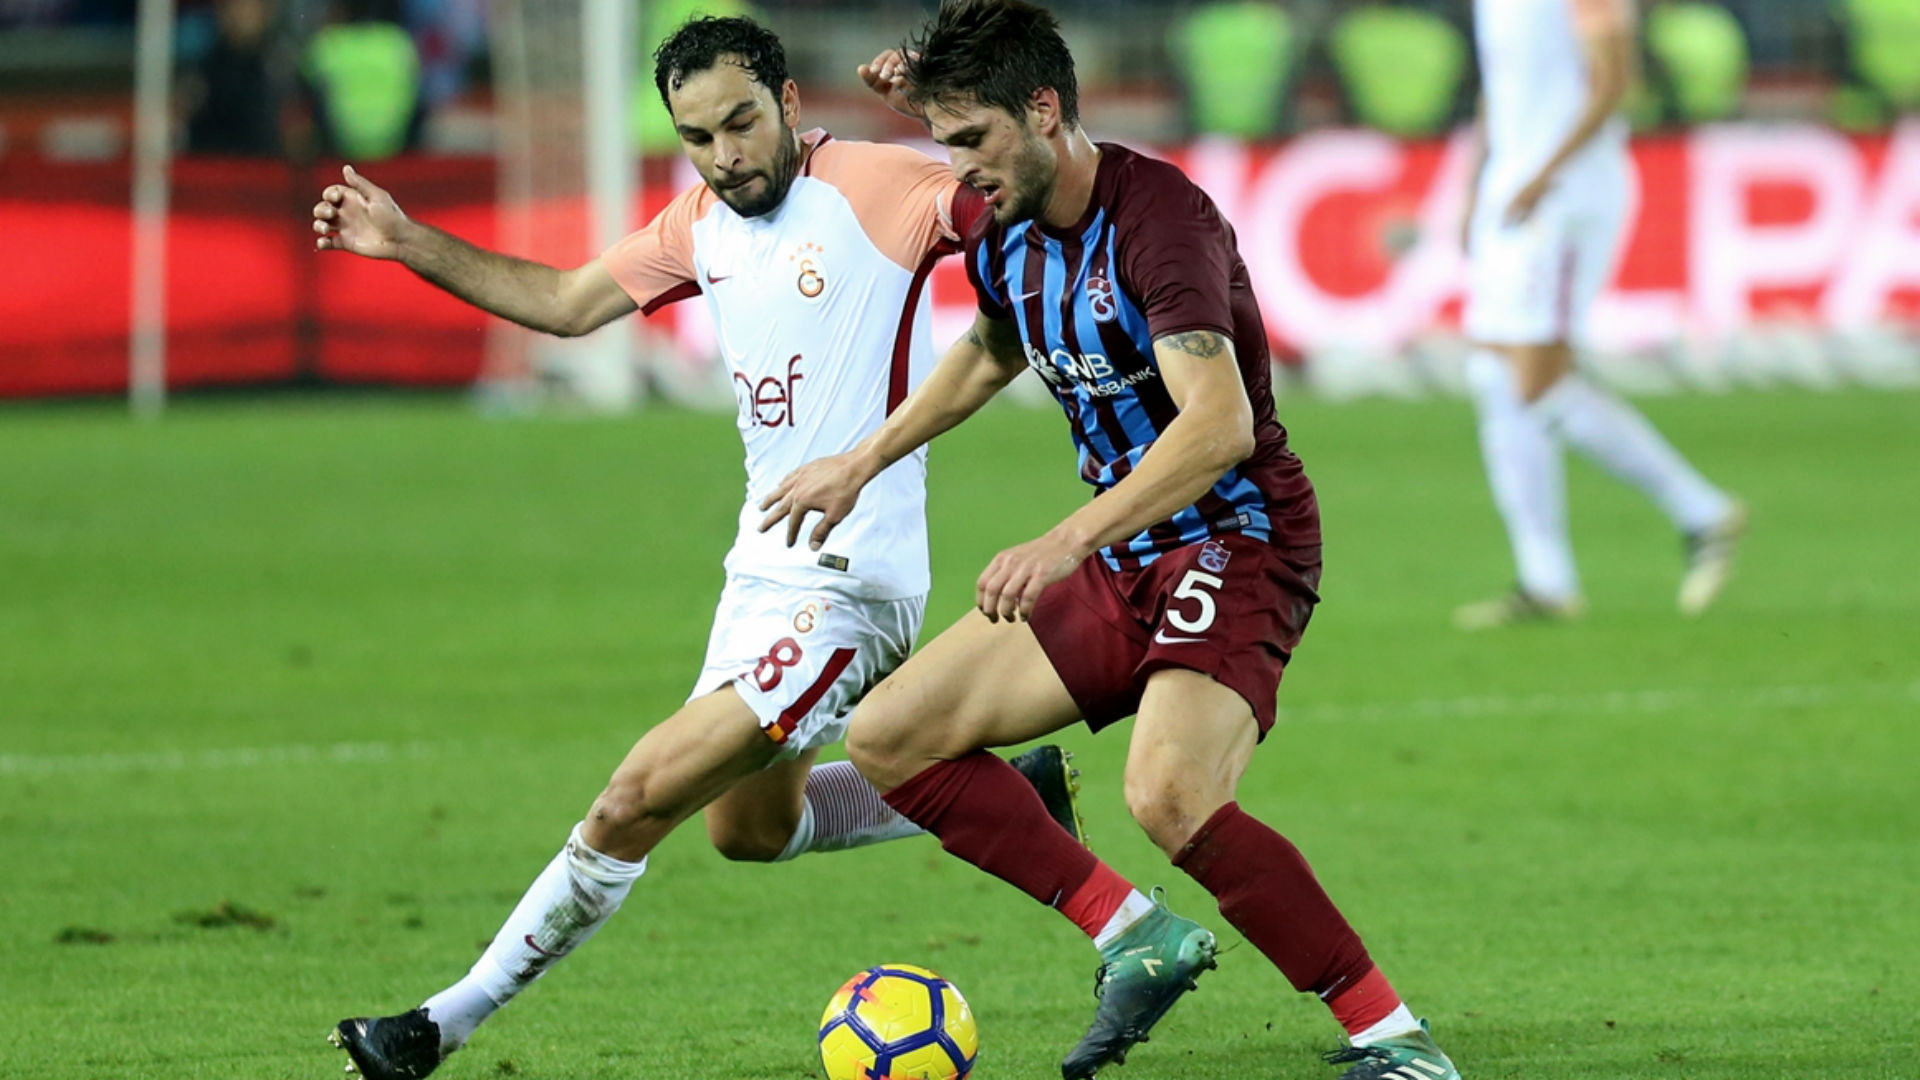 Selcuk İnan Okay Yokuslu Trabzonspor Galatasaray 10292017